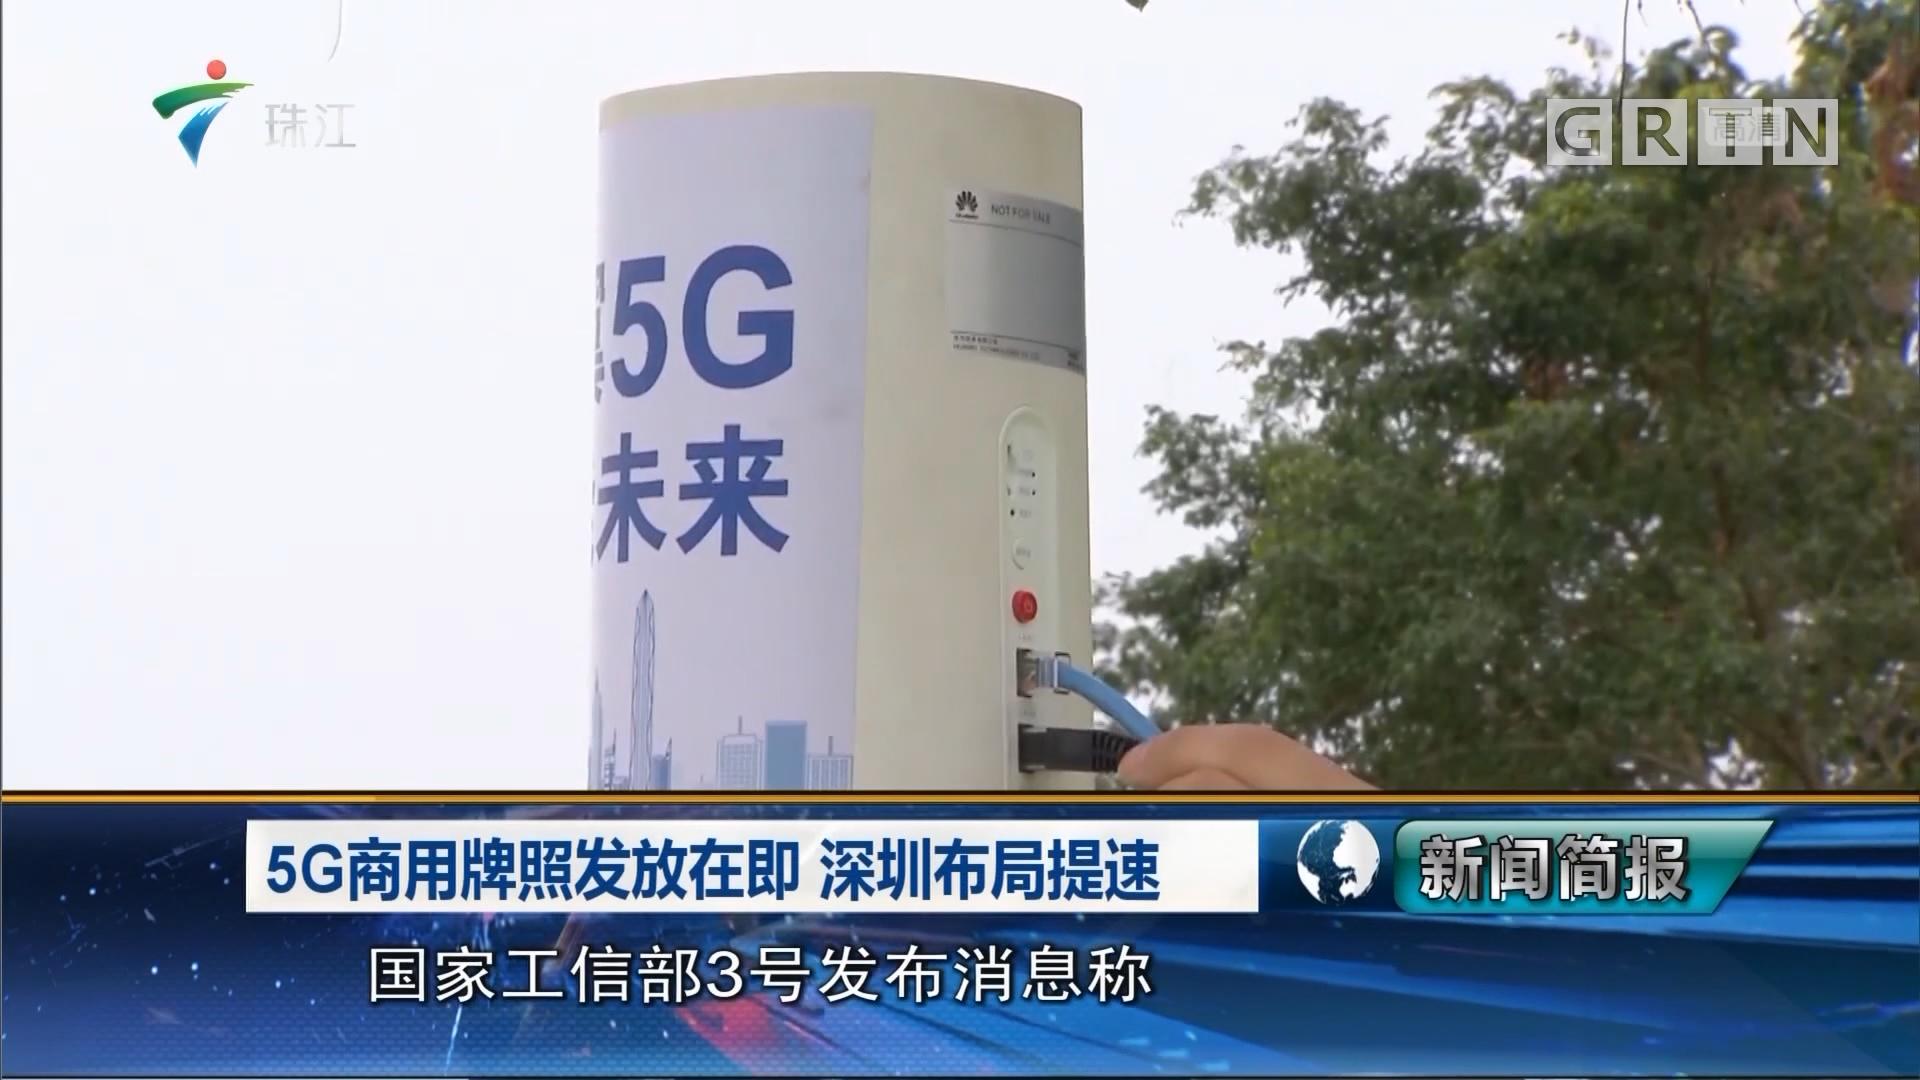 5G商用牌照发放在即 深圳布局提速